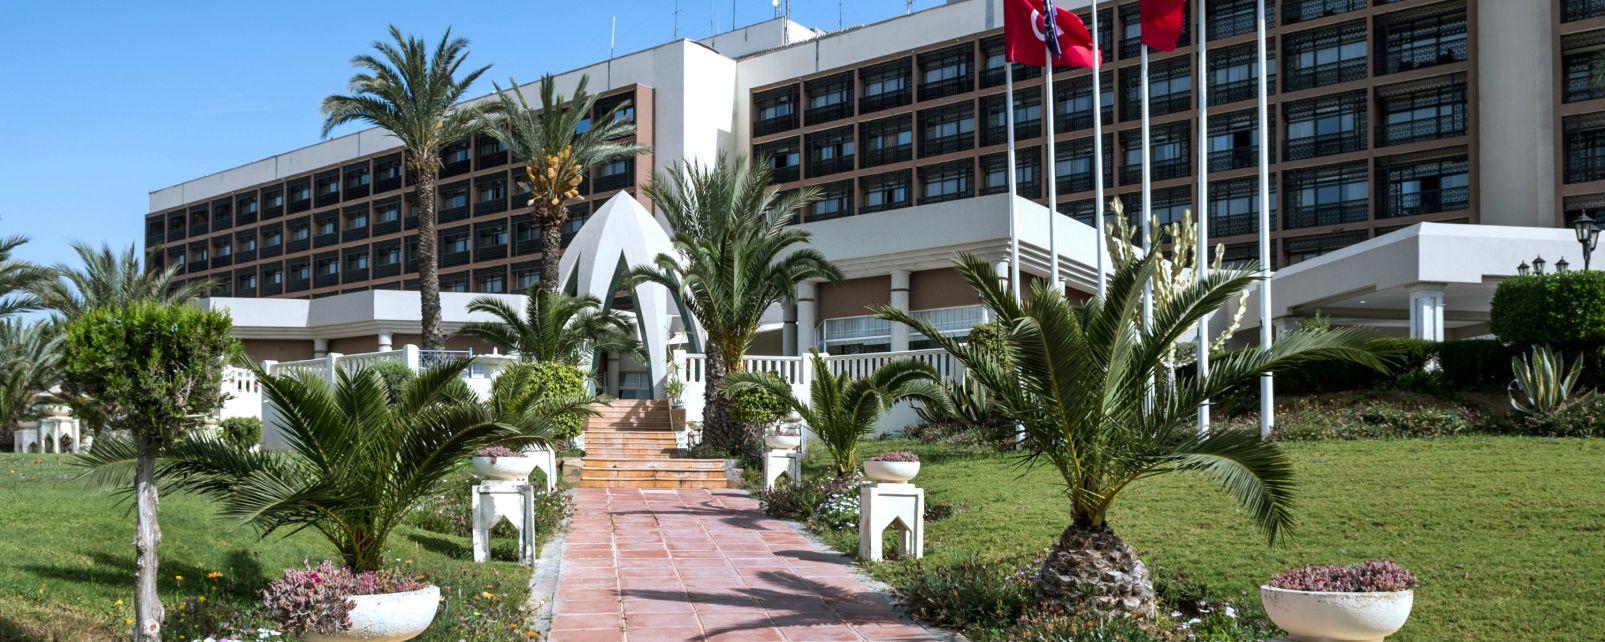 Hôtel Sheraton Tunis